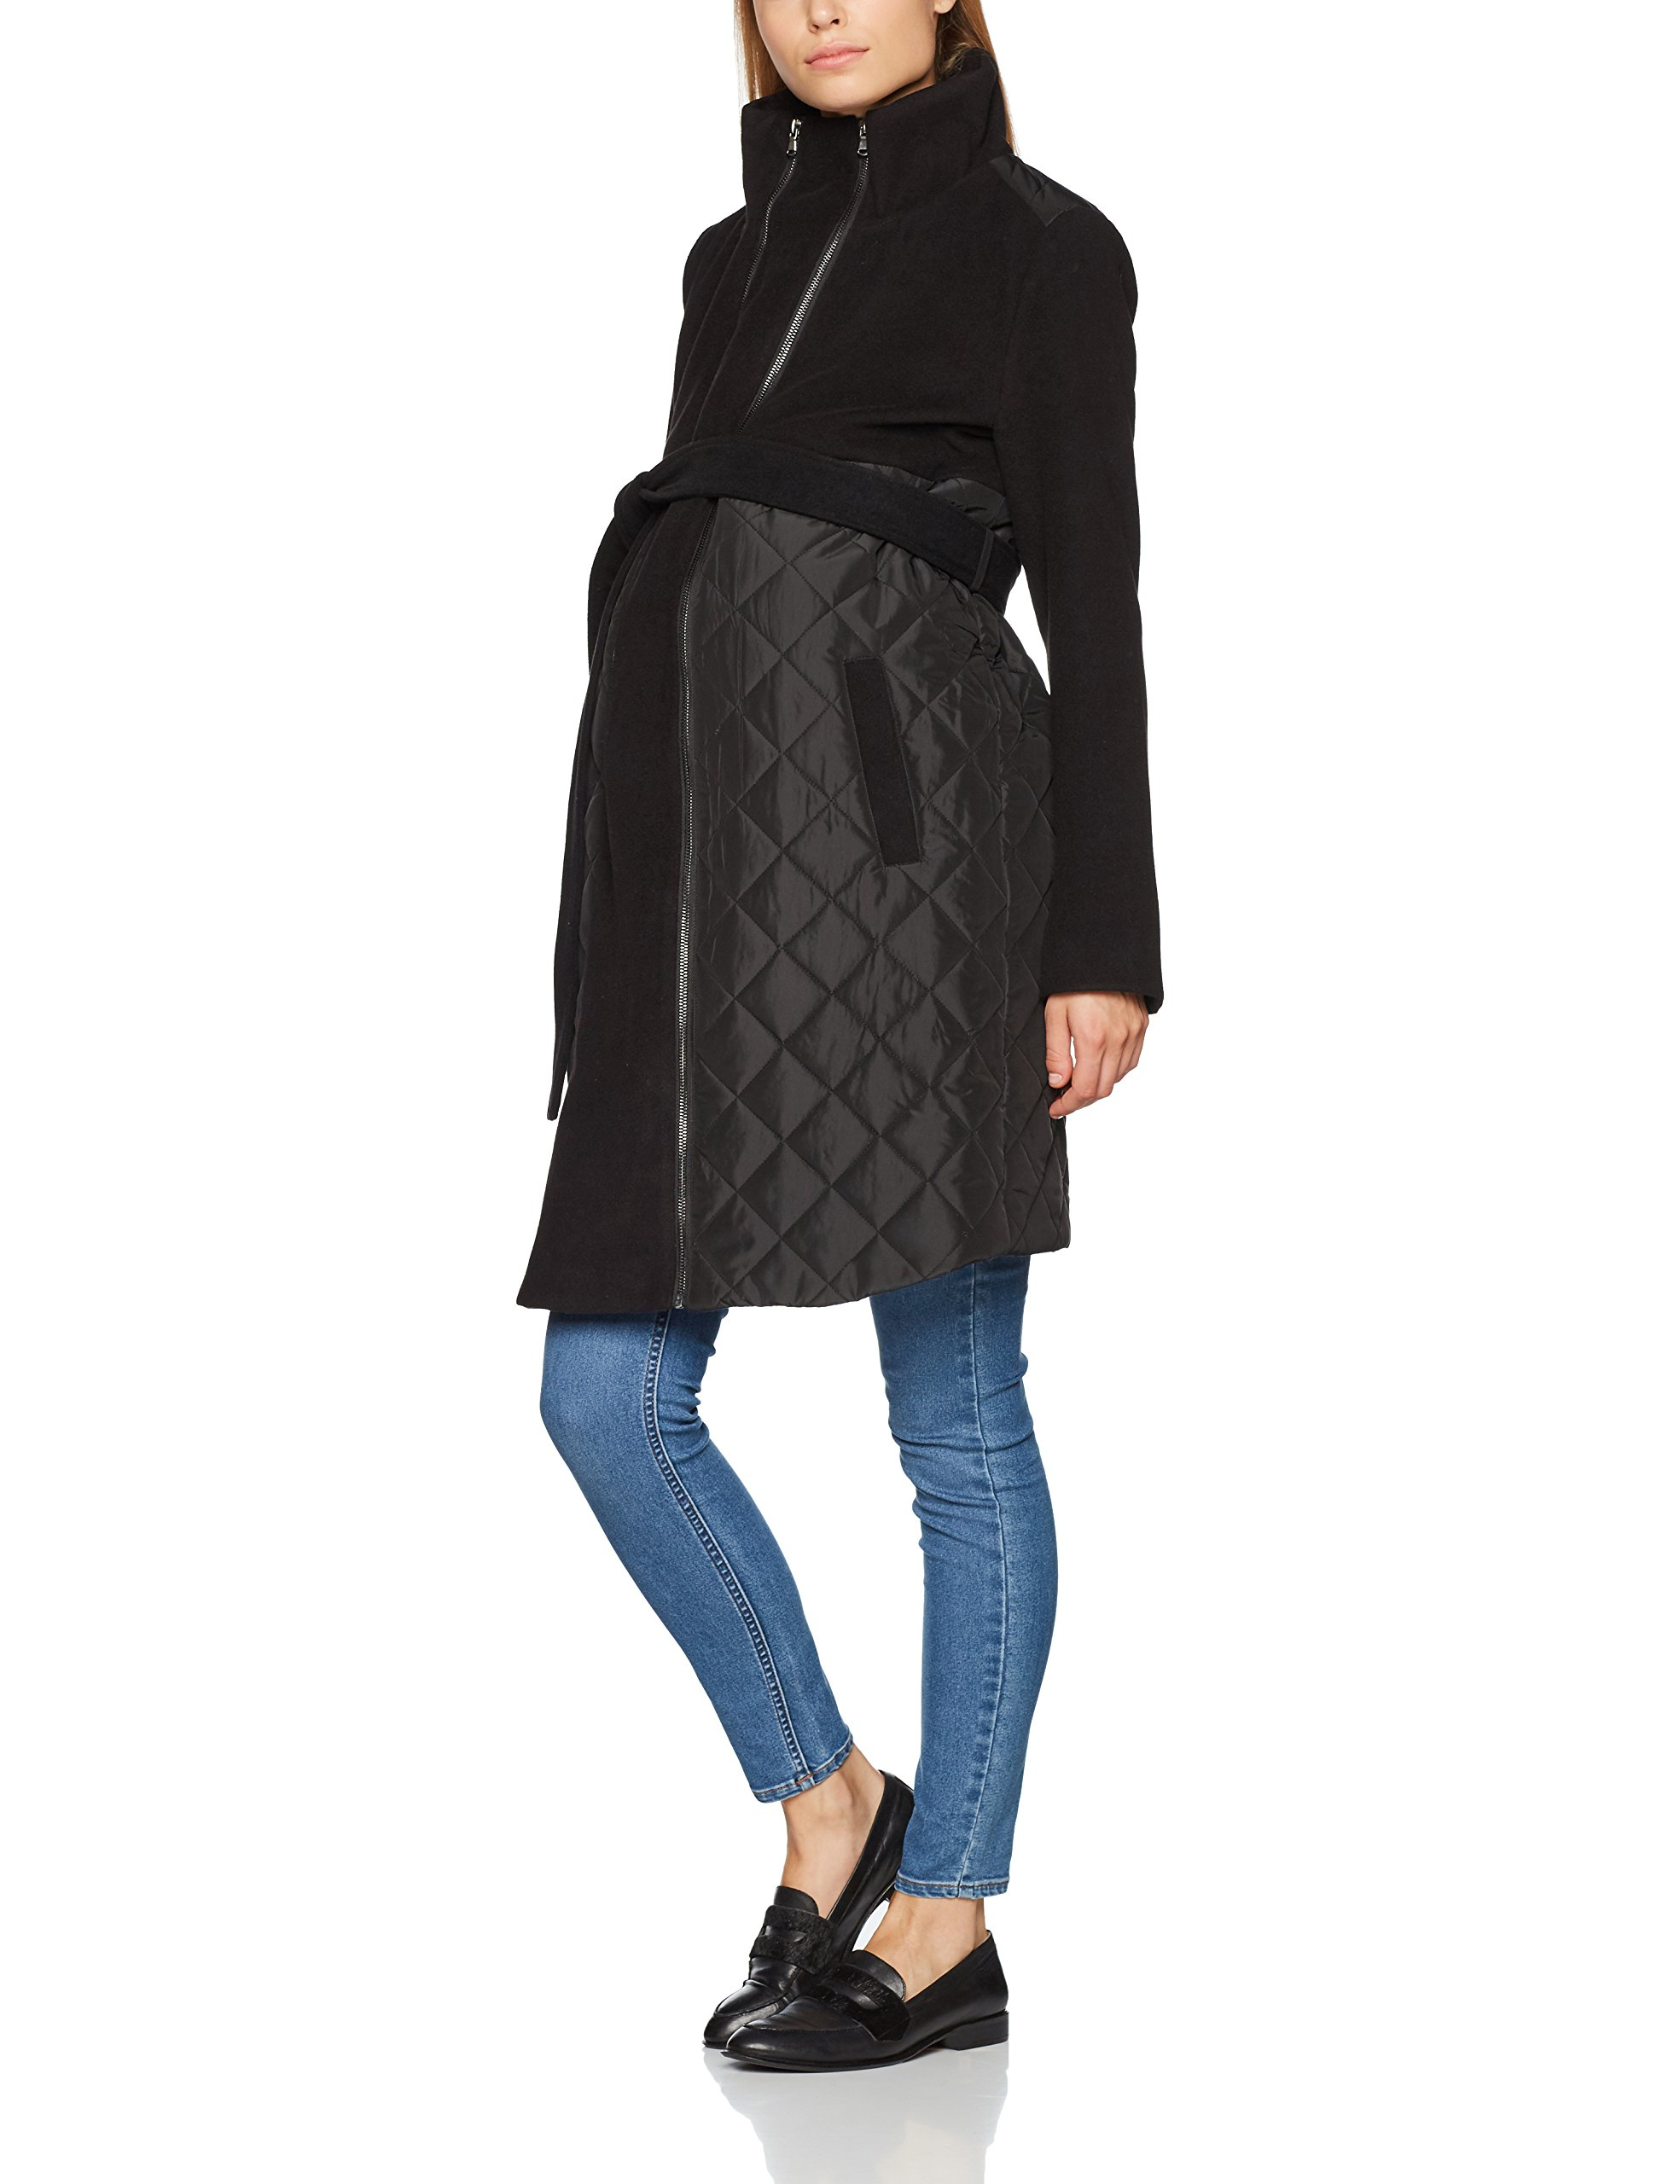 Black38taille vêtements FabricantMediumFemmes Mix Mlnewgiggi Mamalicious VesteNoir De Maternité Jacket Tikka FcJlK1